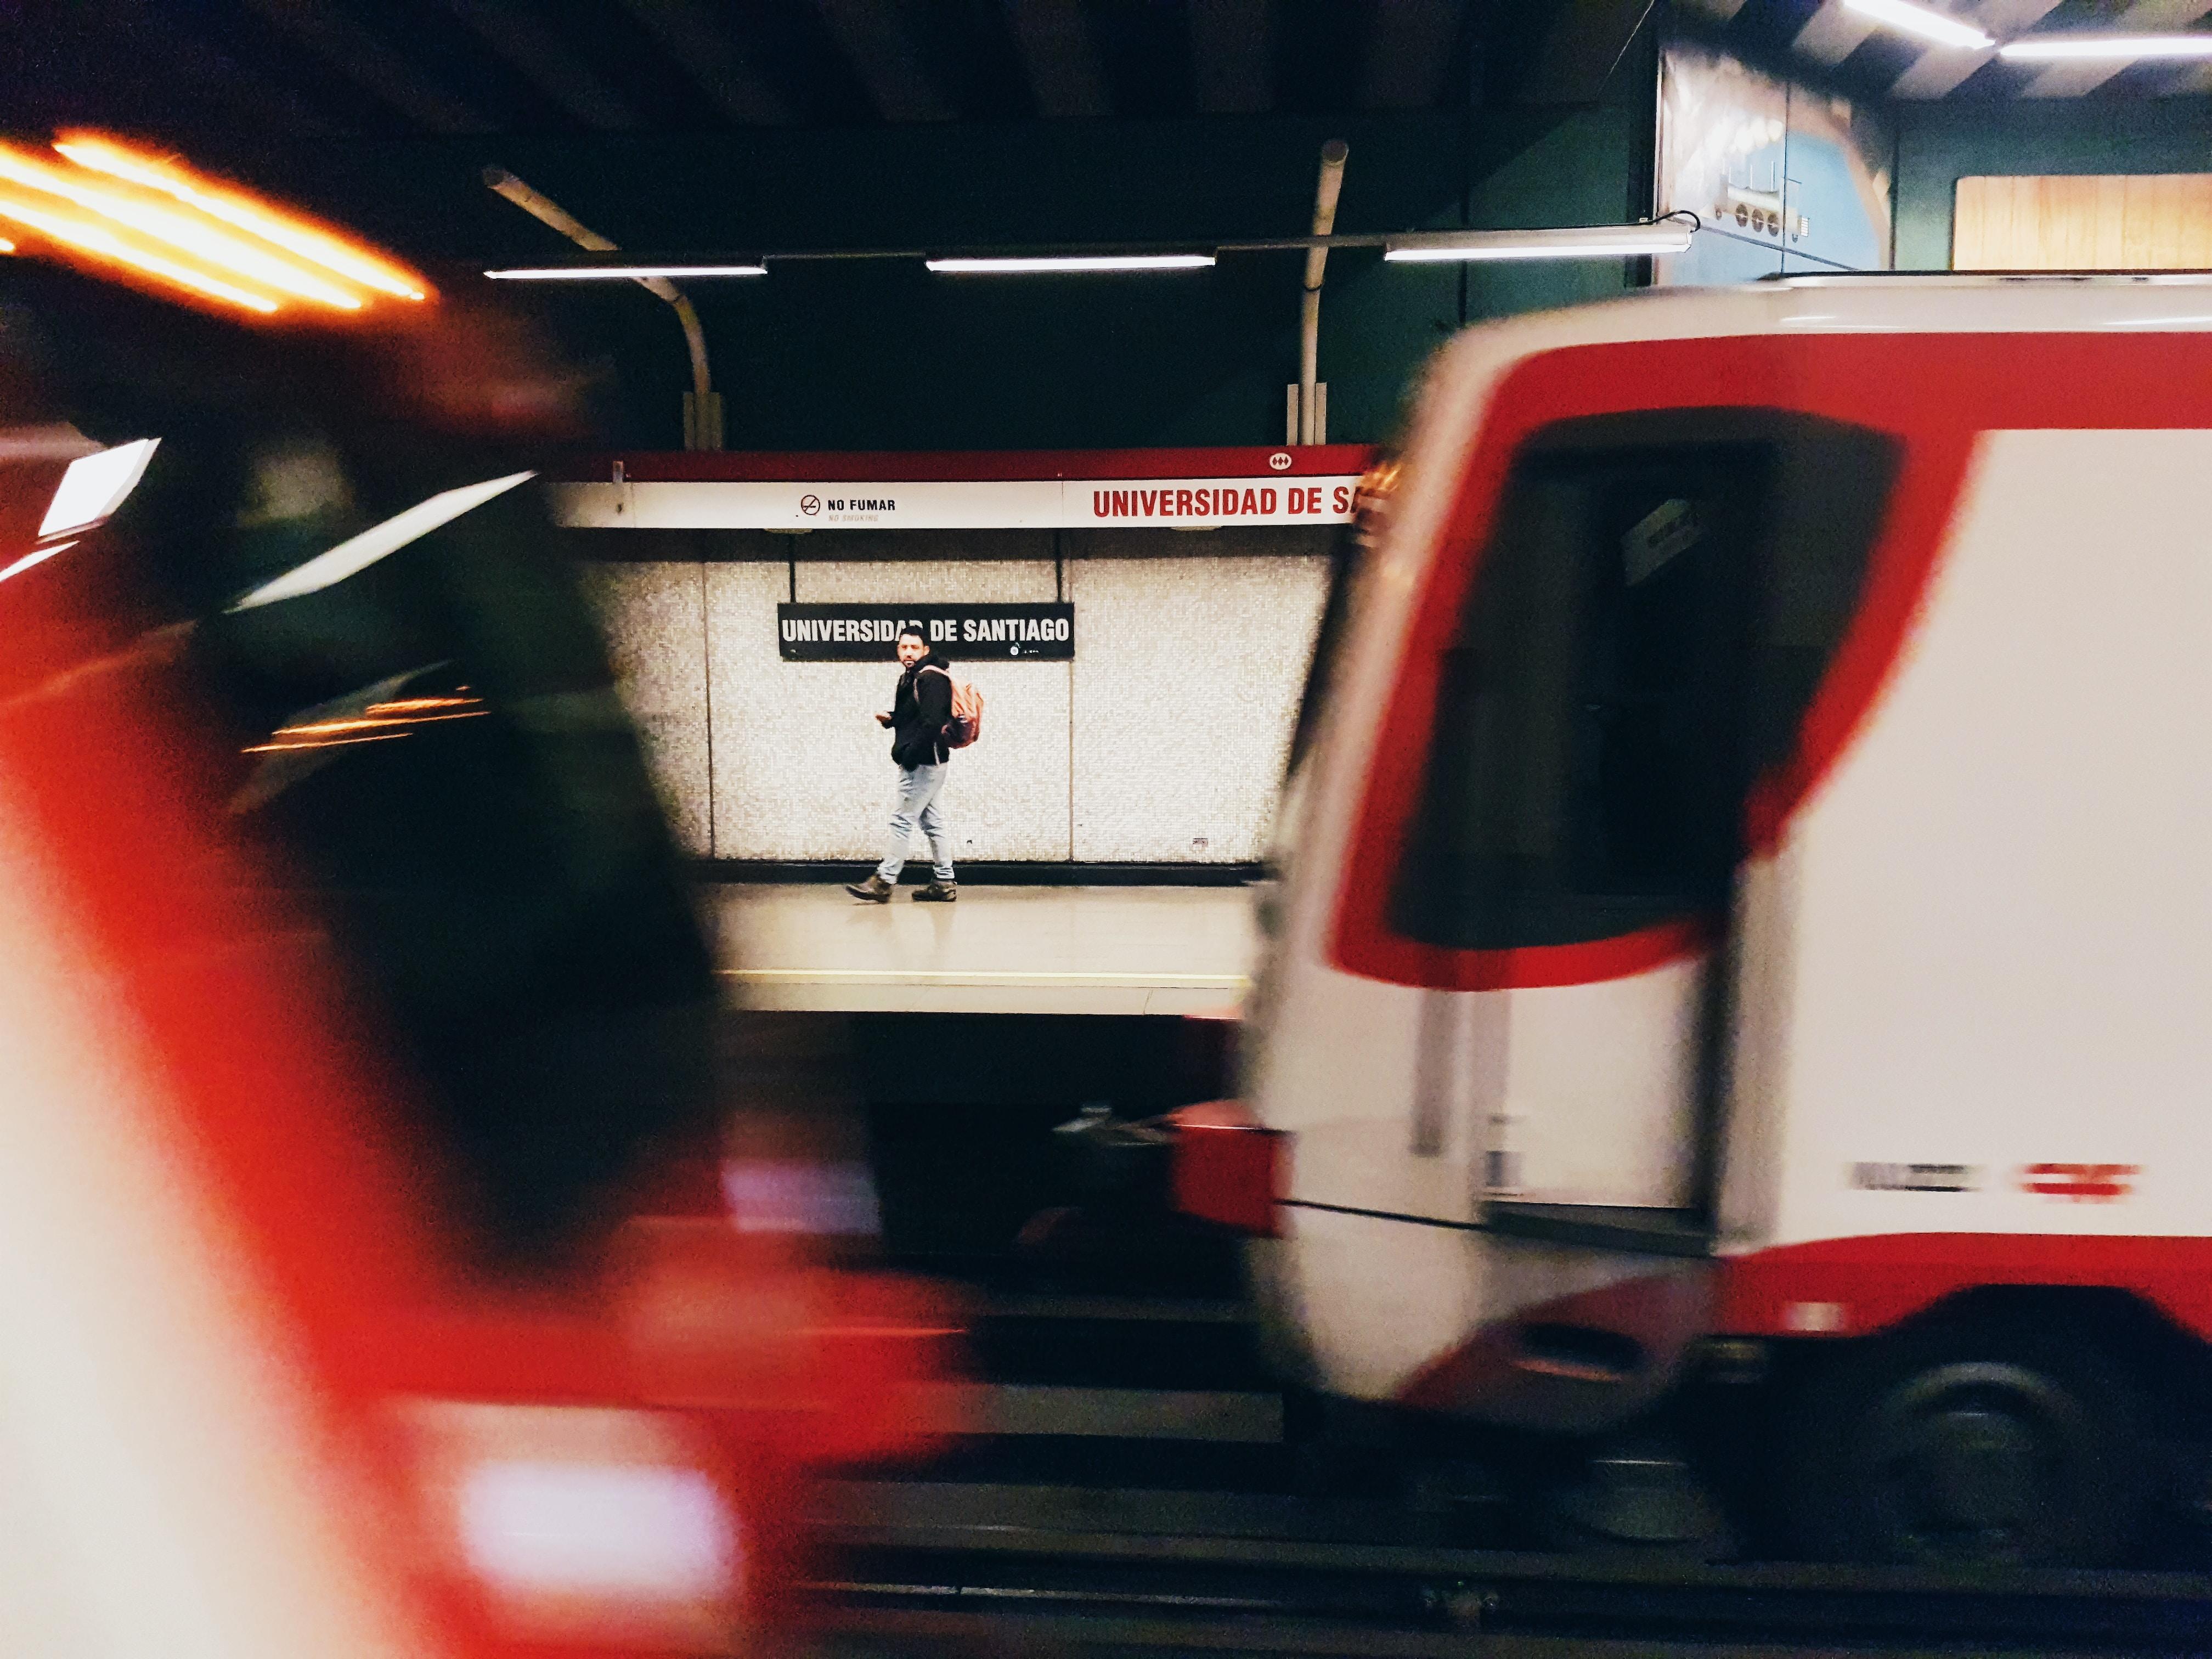 man walking near train